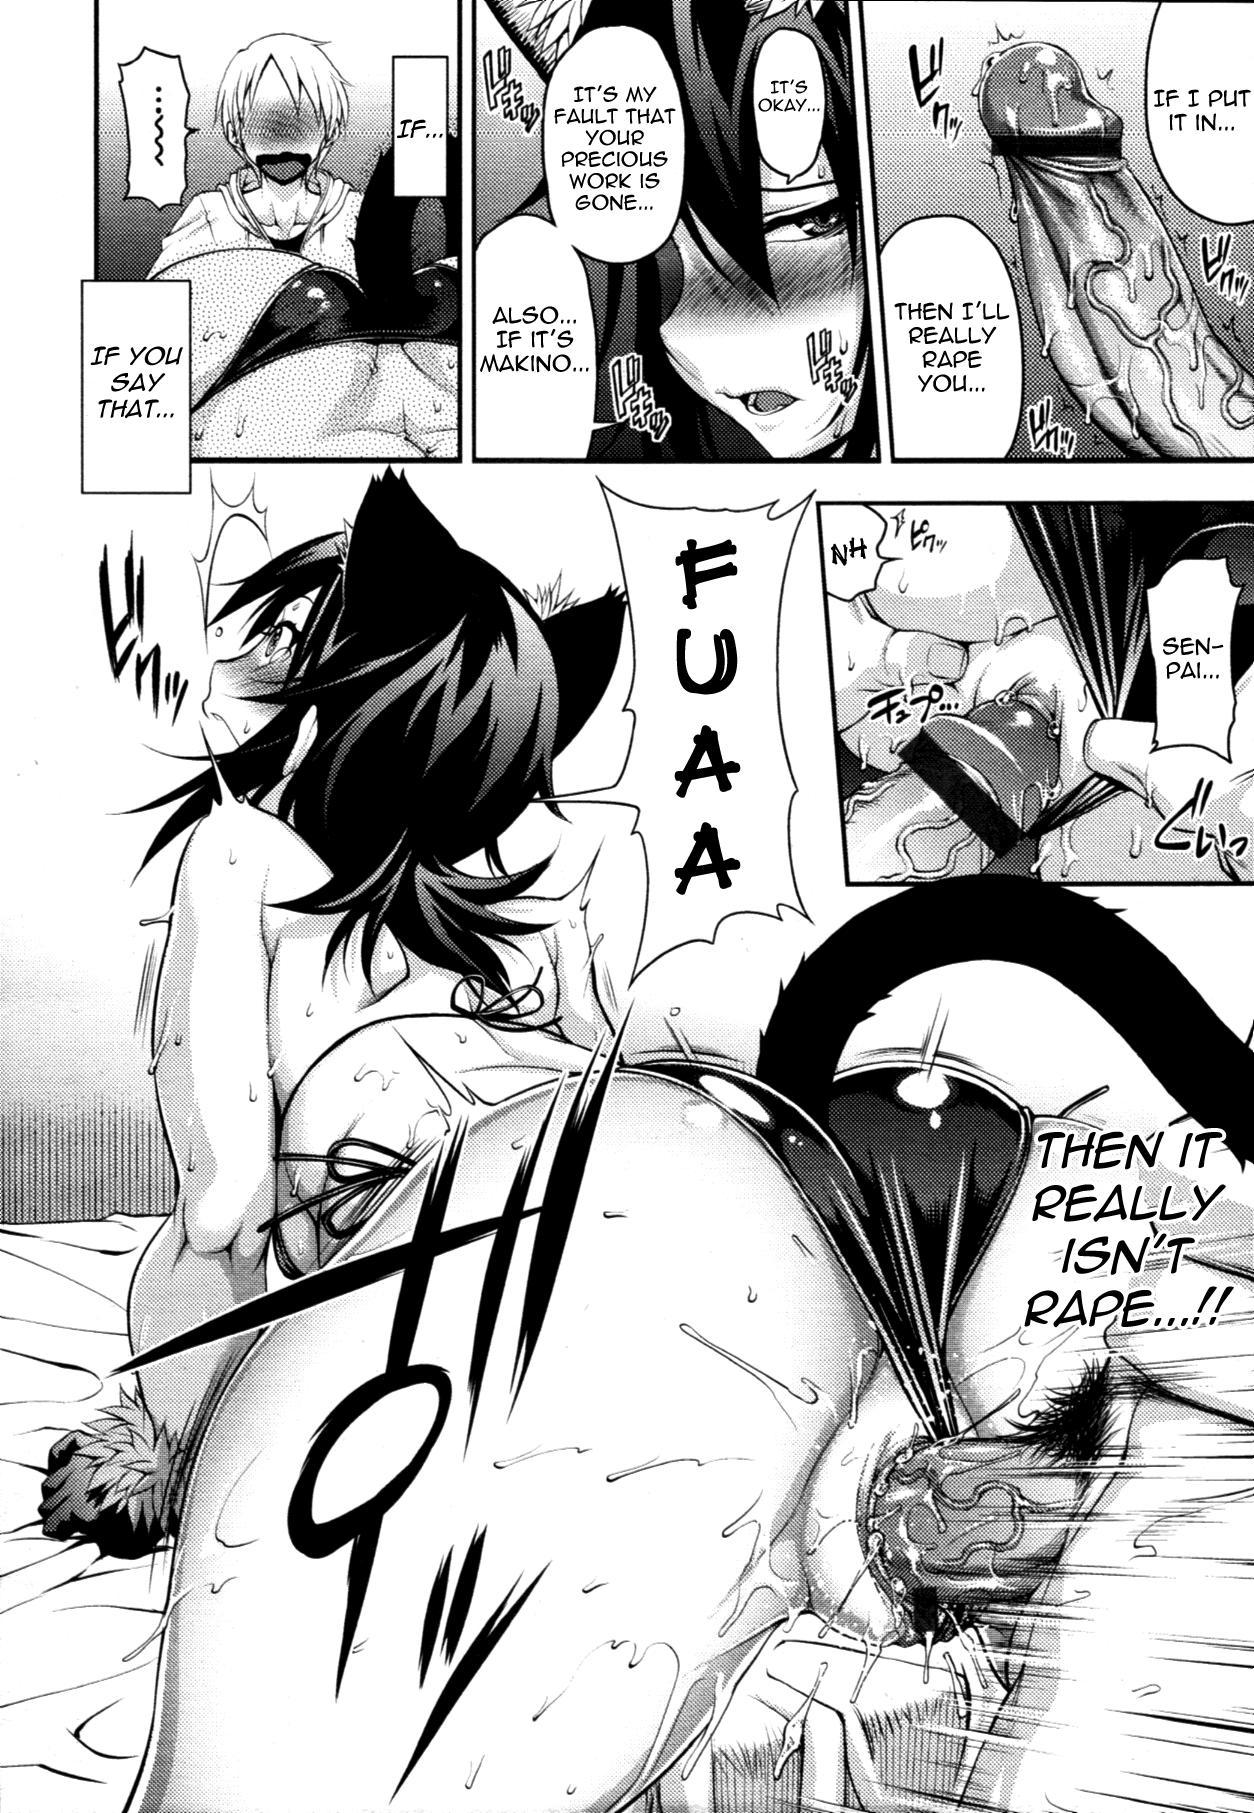 Wazawai Tenjite Neko to Naru | Turn Calamity Into A Cat 11